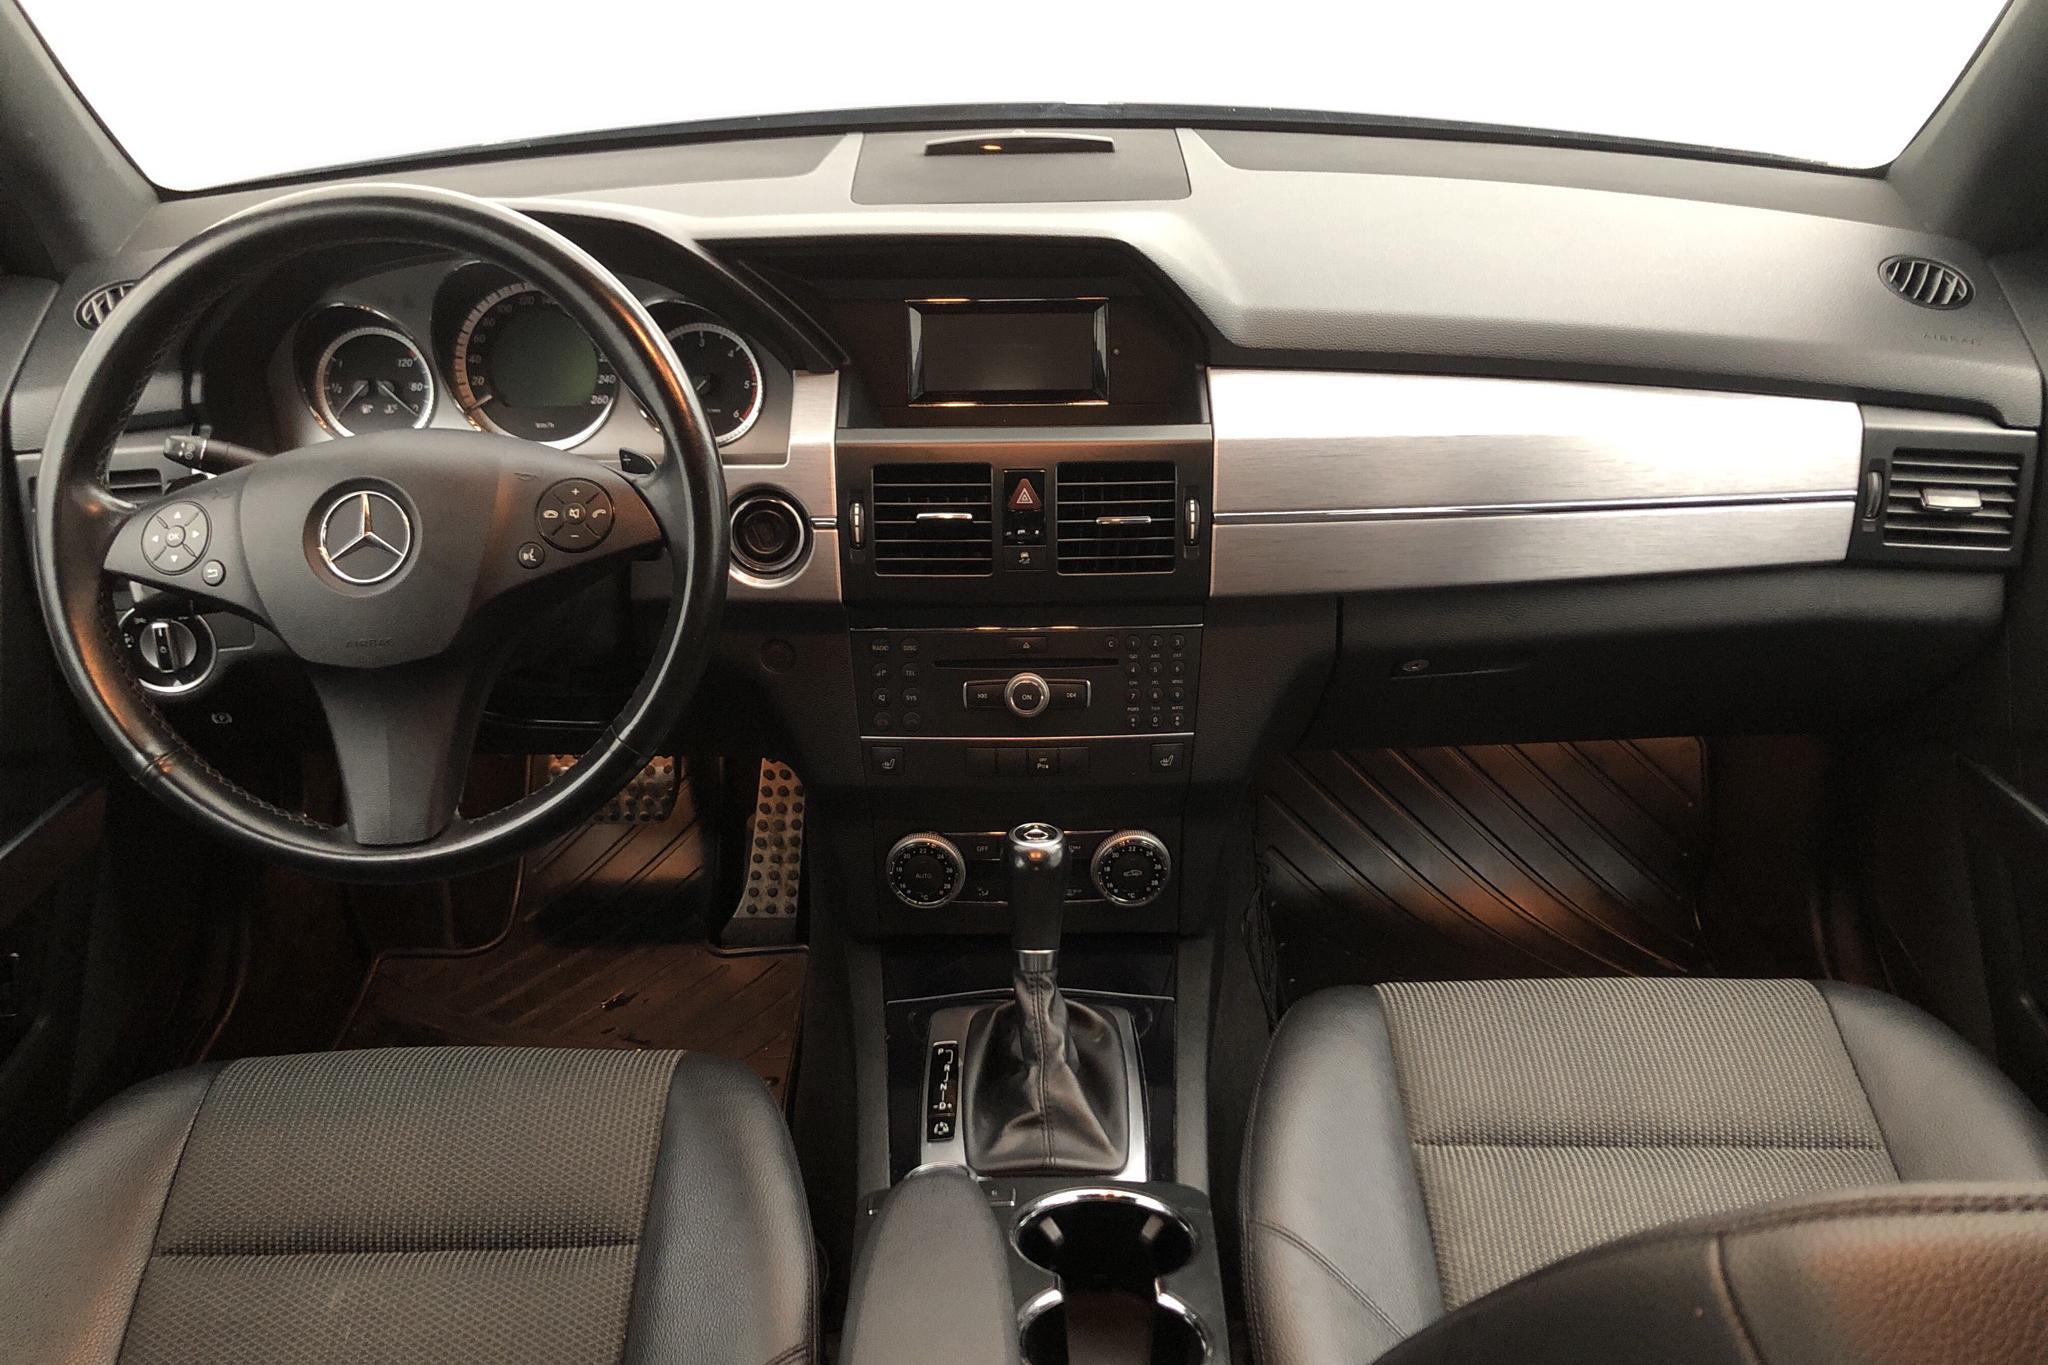 Mercedes GLK 220 CDI BlueEFFICIENCY 4MATIC (170hk) - 14 970 mil - Automat - Dark Blue - 2011